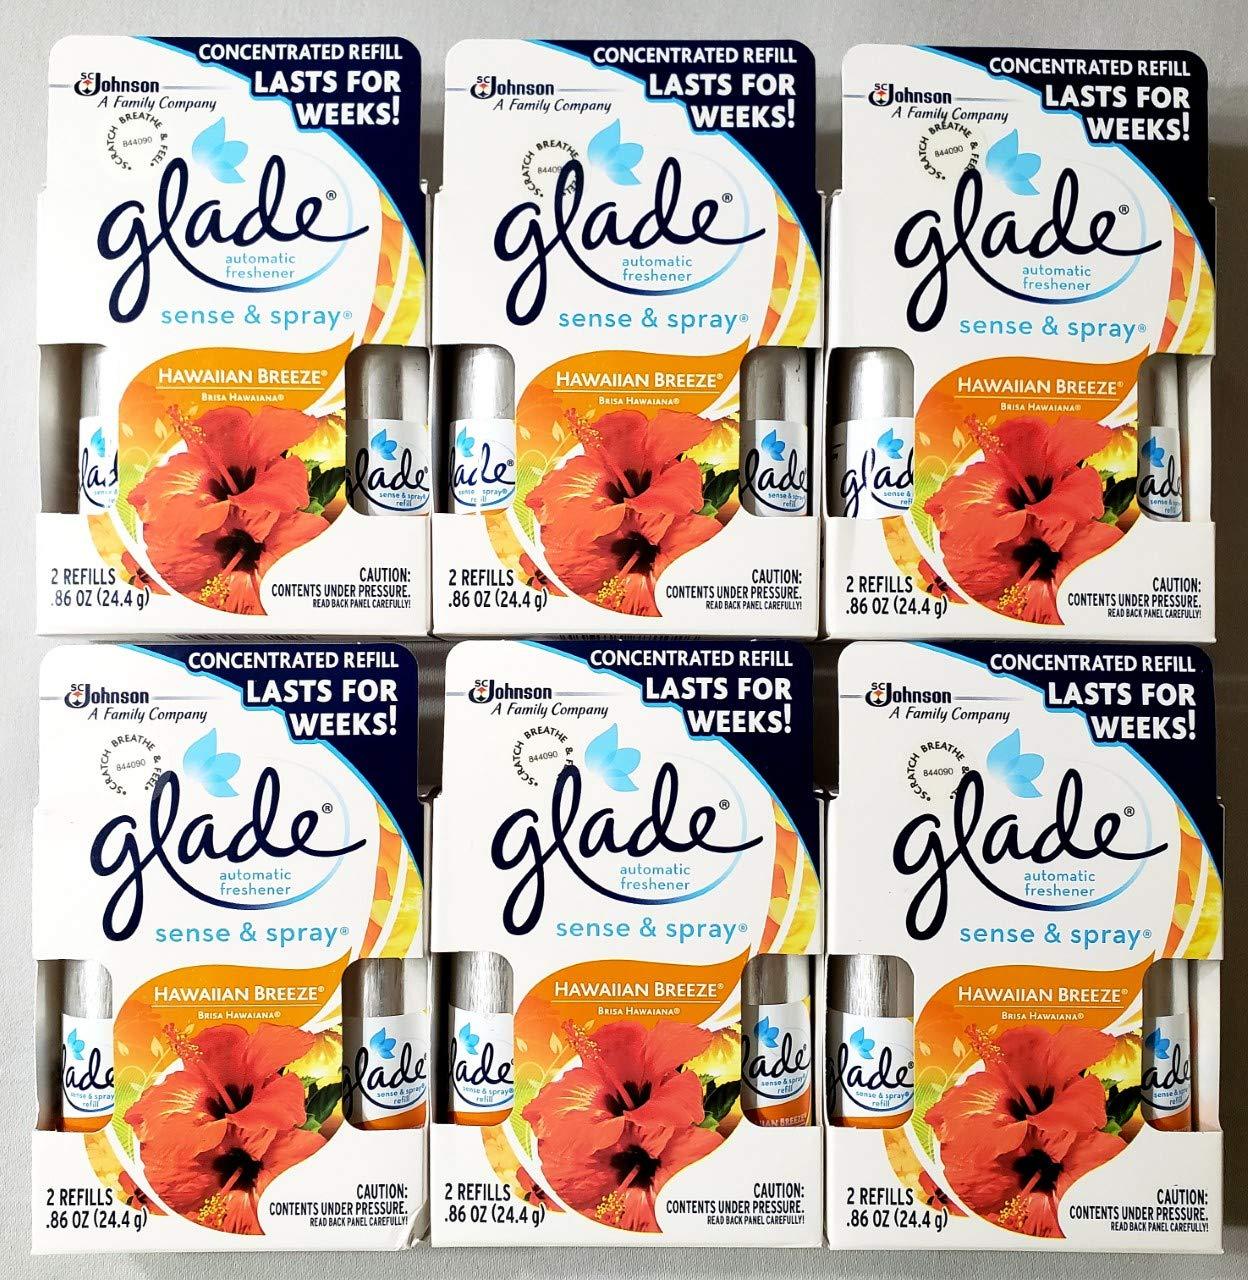 12 Glade Sense & Spray Automatic Refills, Hawaiian Breeze (6 Twin Packs) in Box by Glade